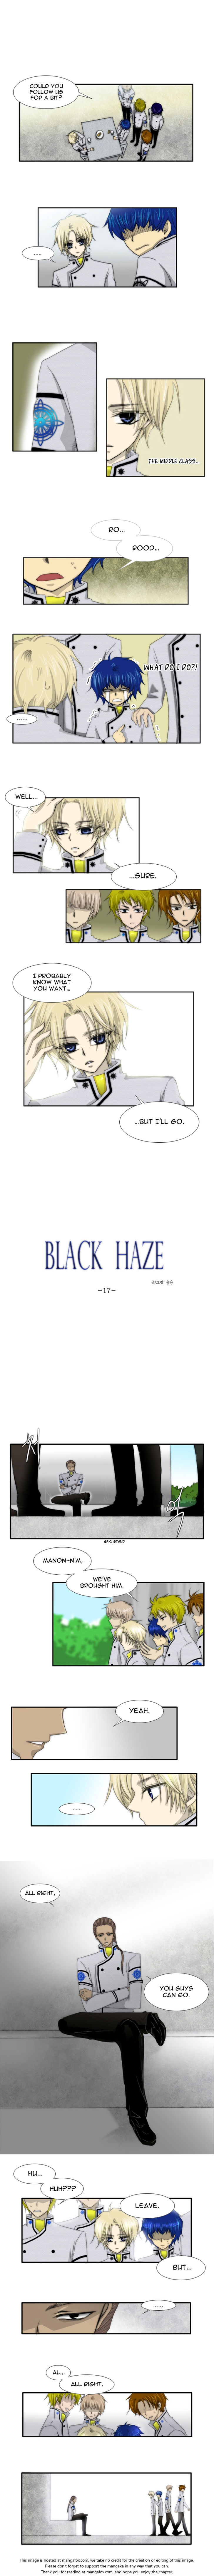 Black Haze 17 at MangaFox.la